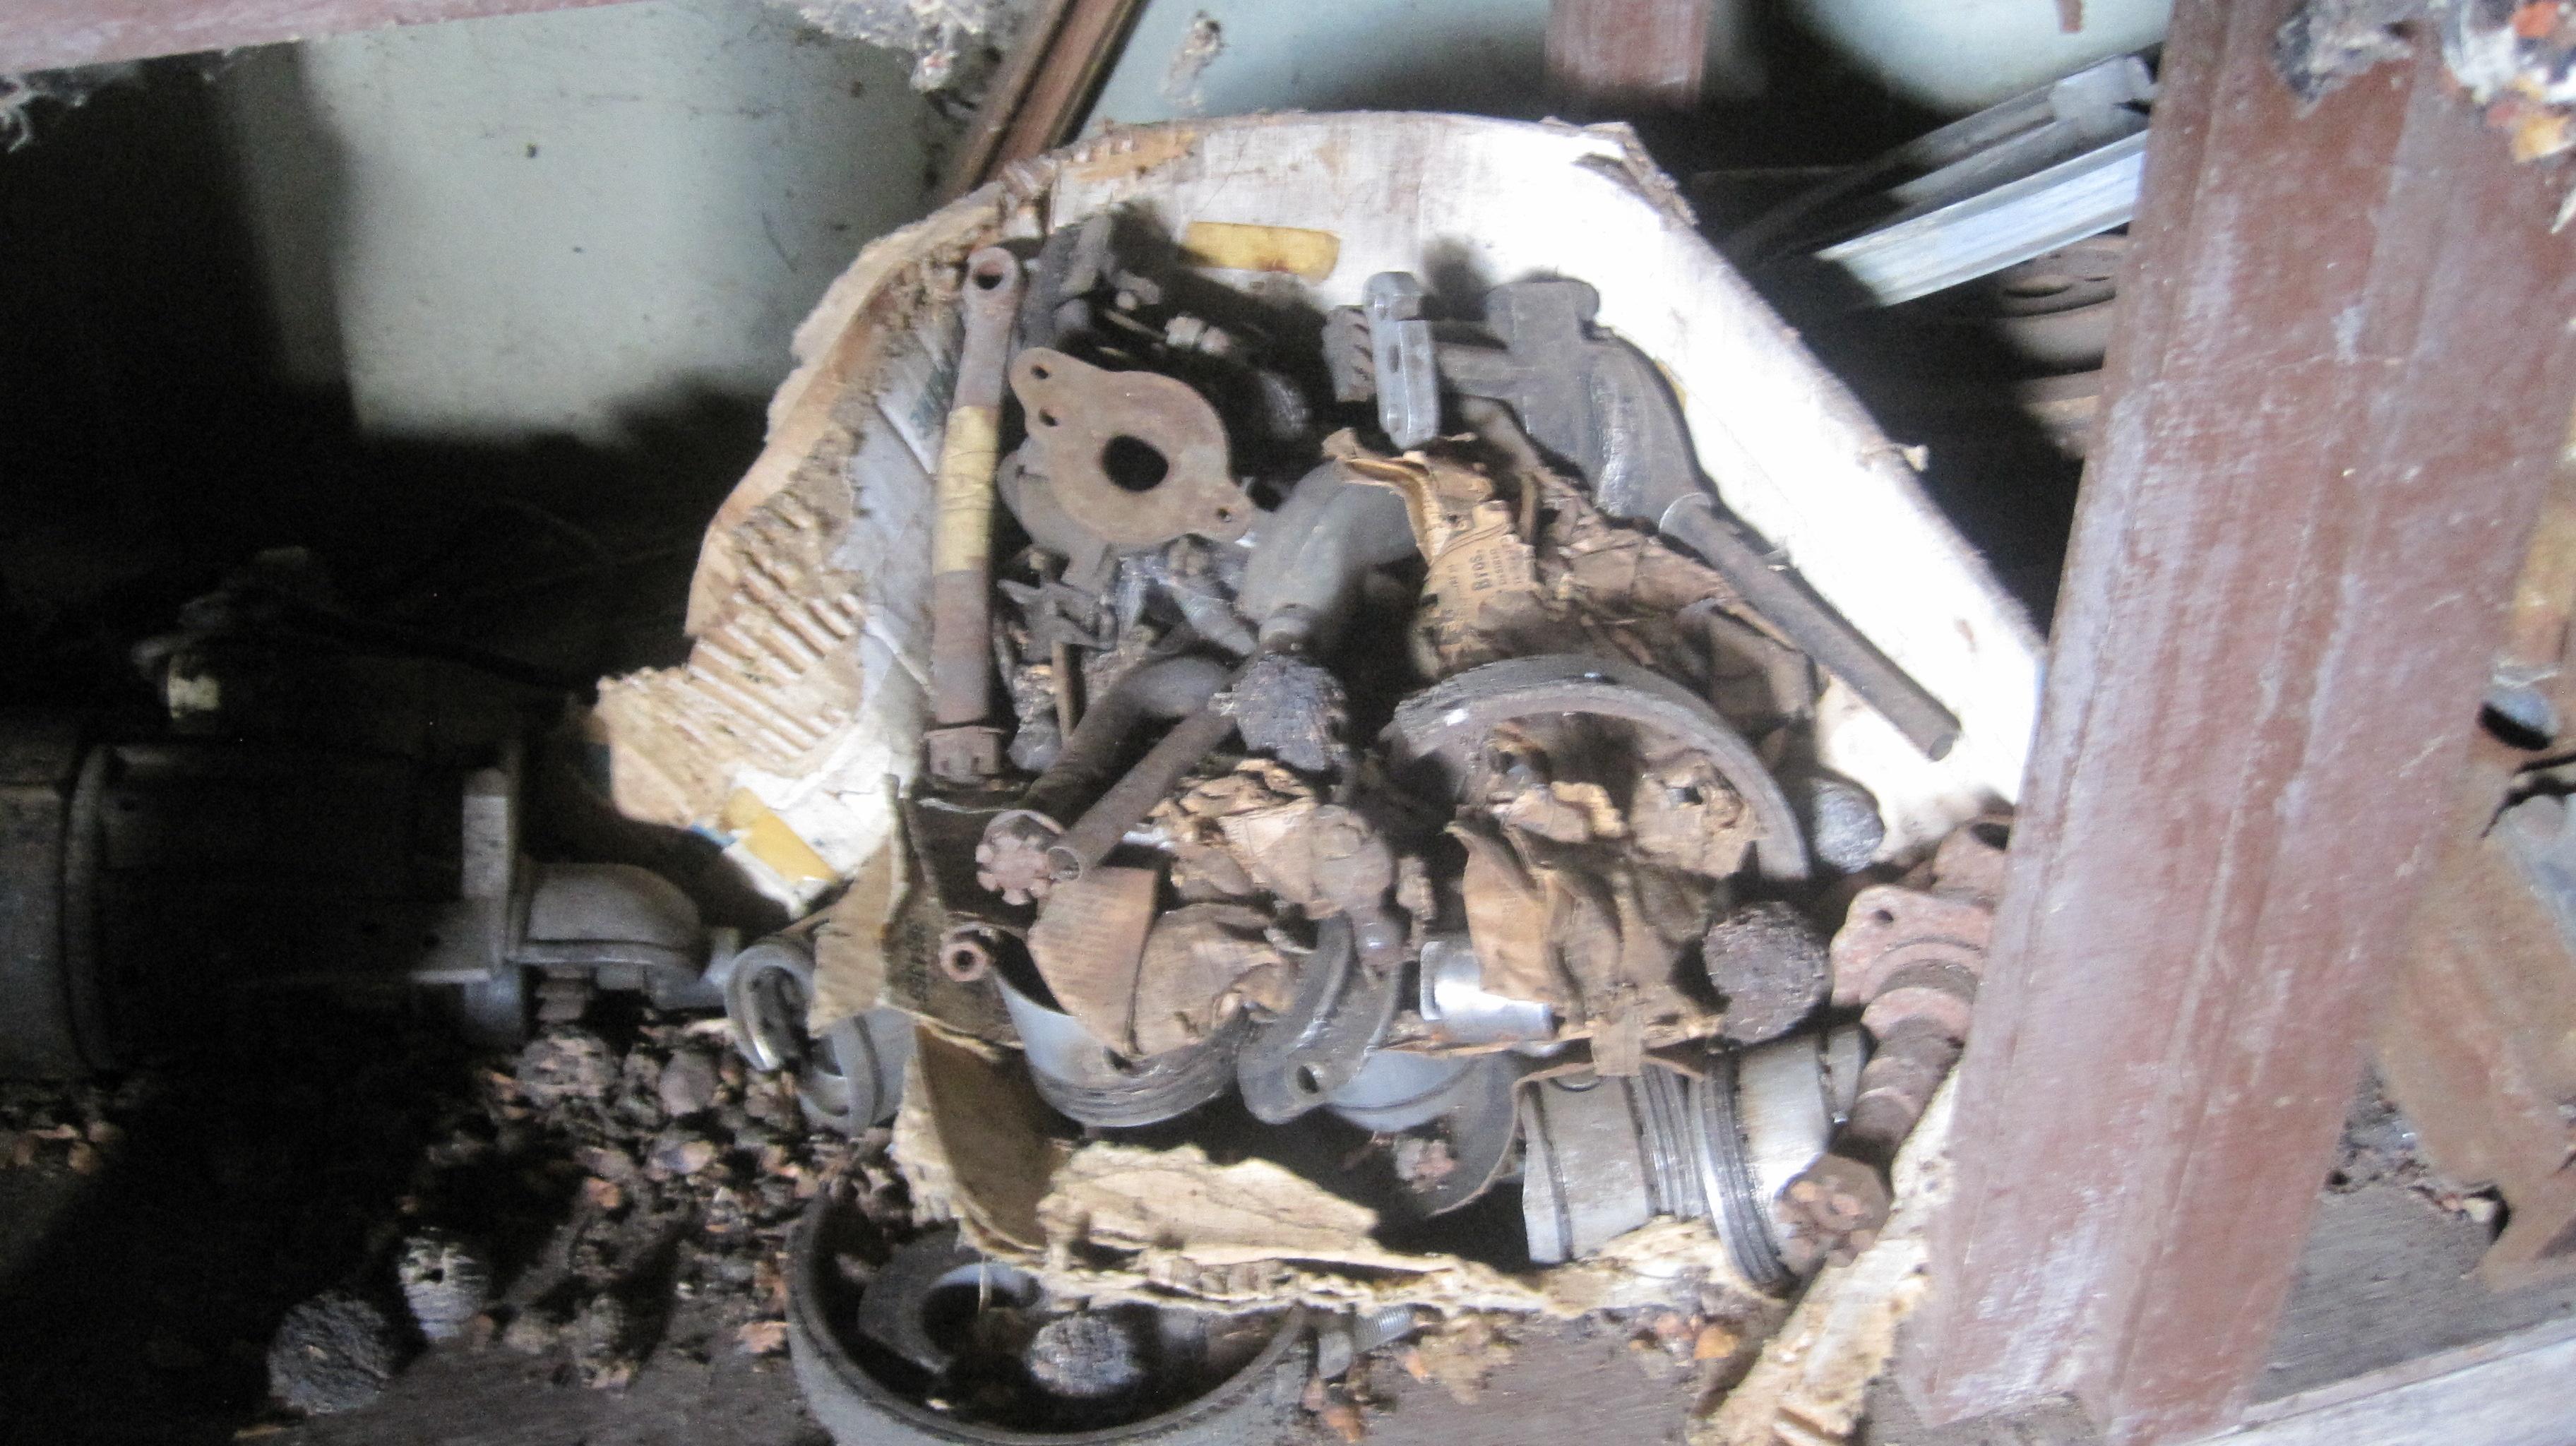 48/49 crosley engine parts driveshaft - Cars For Sale - Antique ...